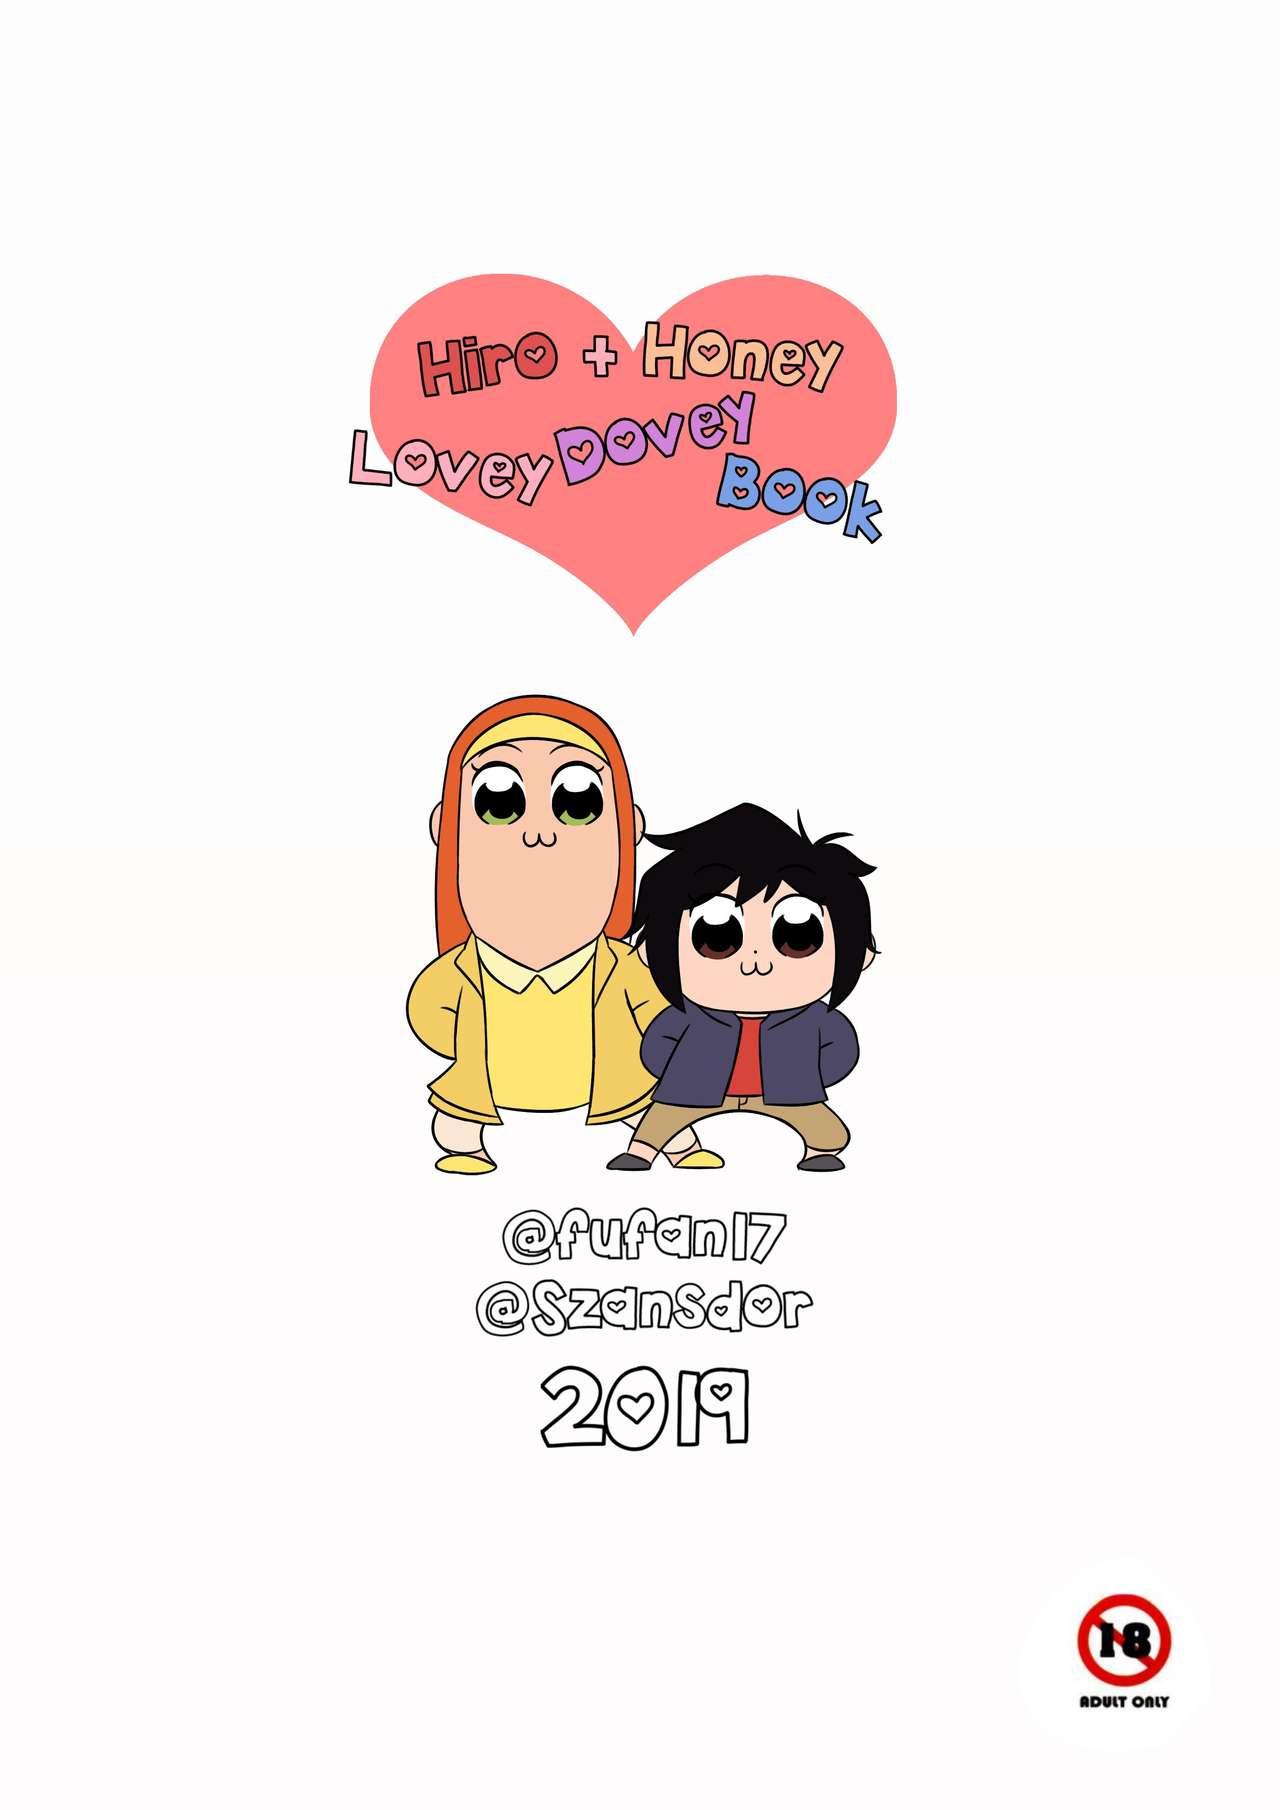 Hiro and Honey Lovey Dovey Book porn comics Oral sex, Blowjob, Cum Shots, cunnilingus, Lolicon, Masturbation, Straight, Straight Shota, X-Ray